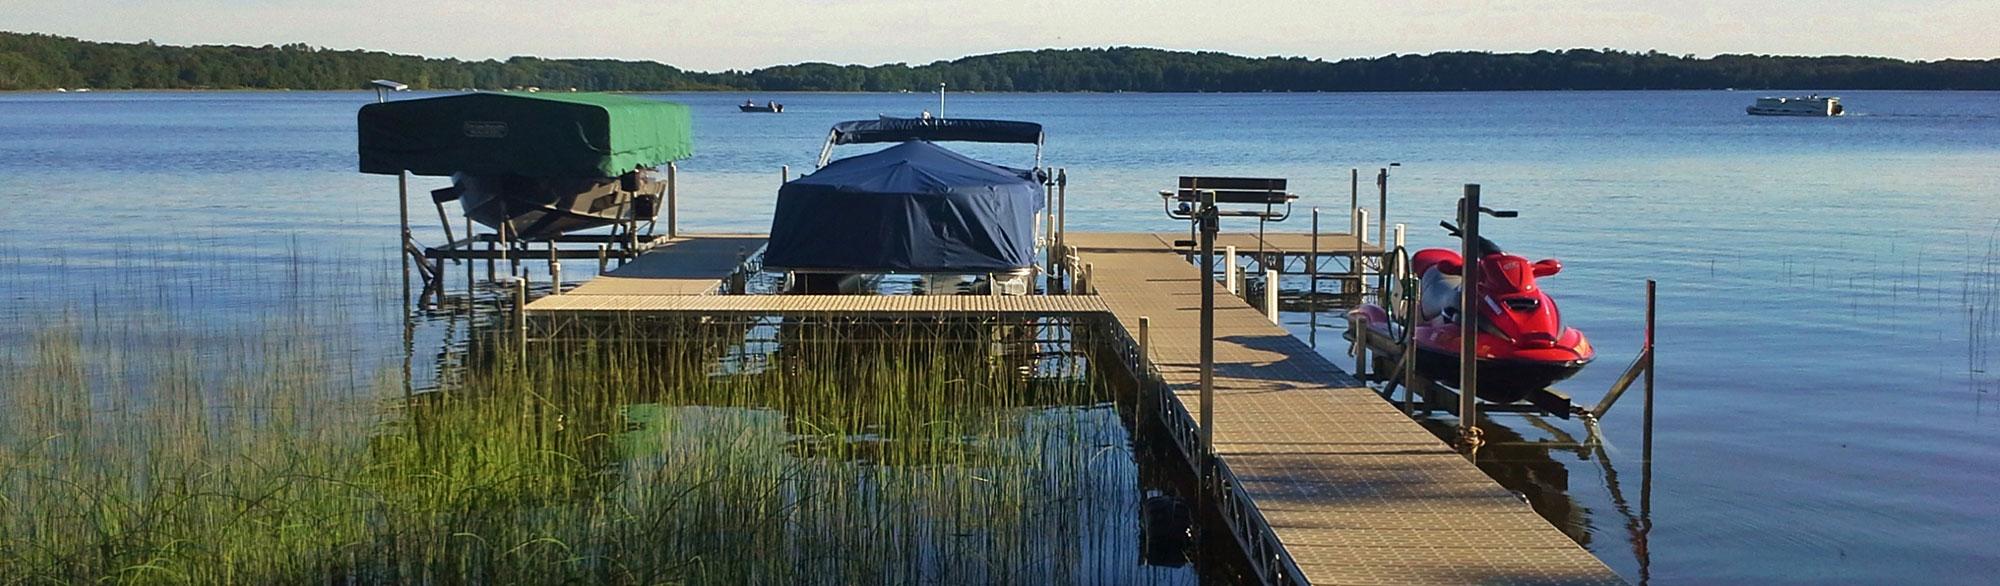 Portable Docks in Wisconsin